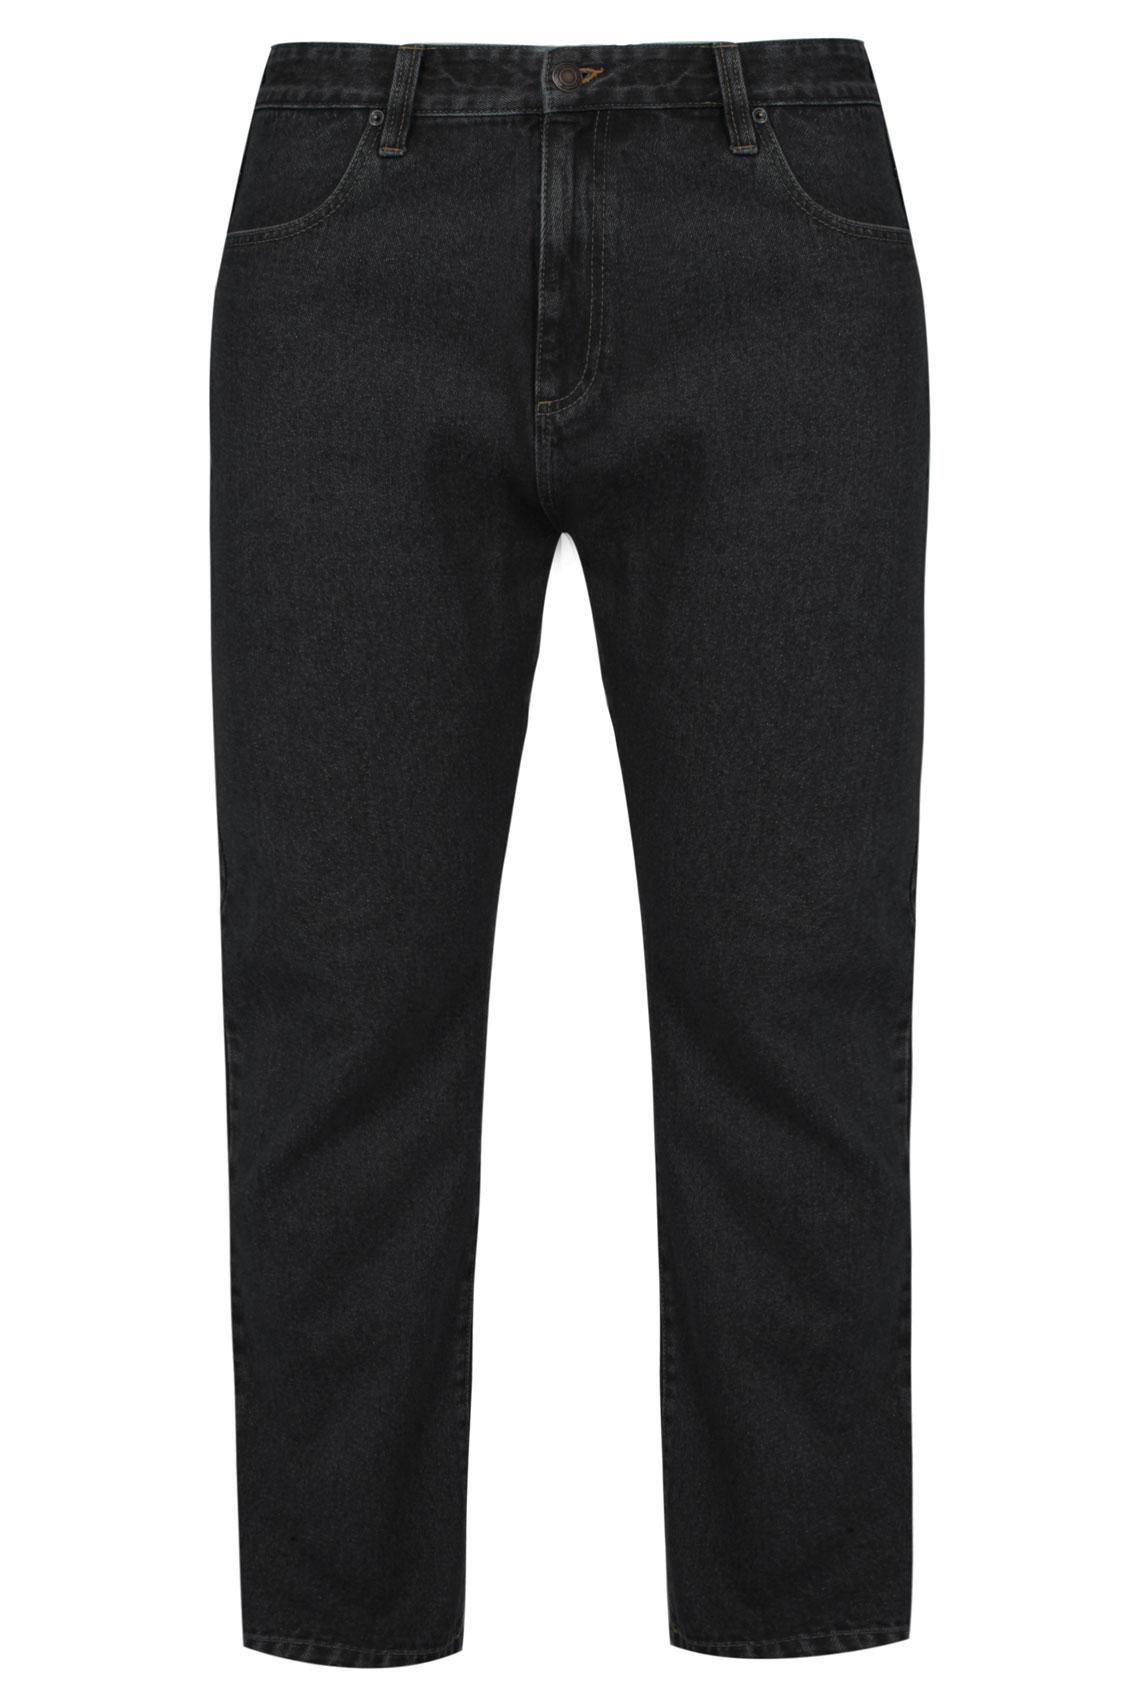 BadRhino Black Denim Straight Leg Jeans